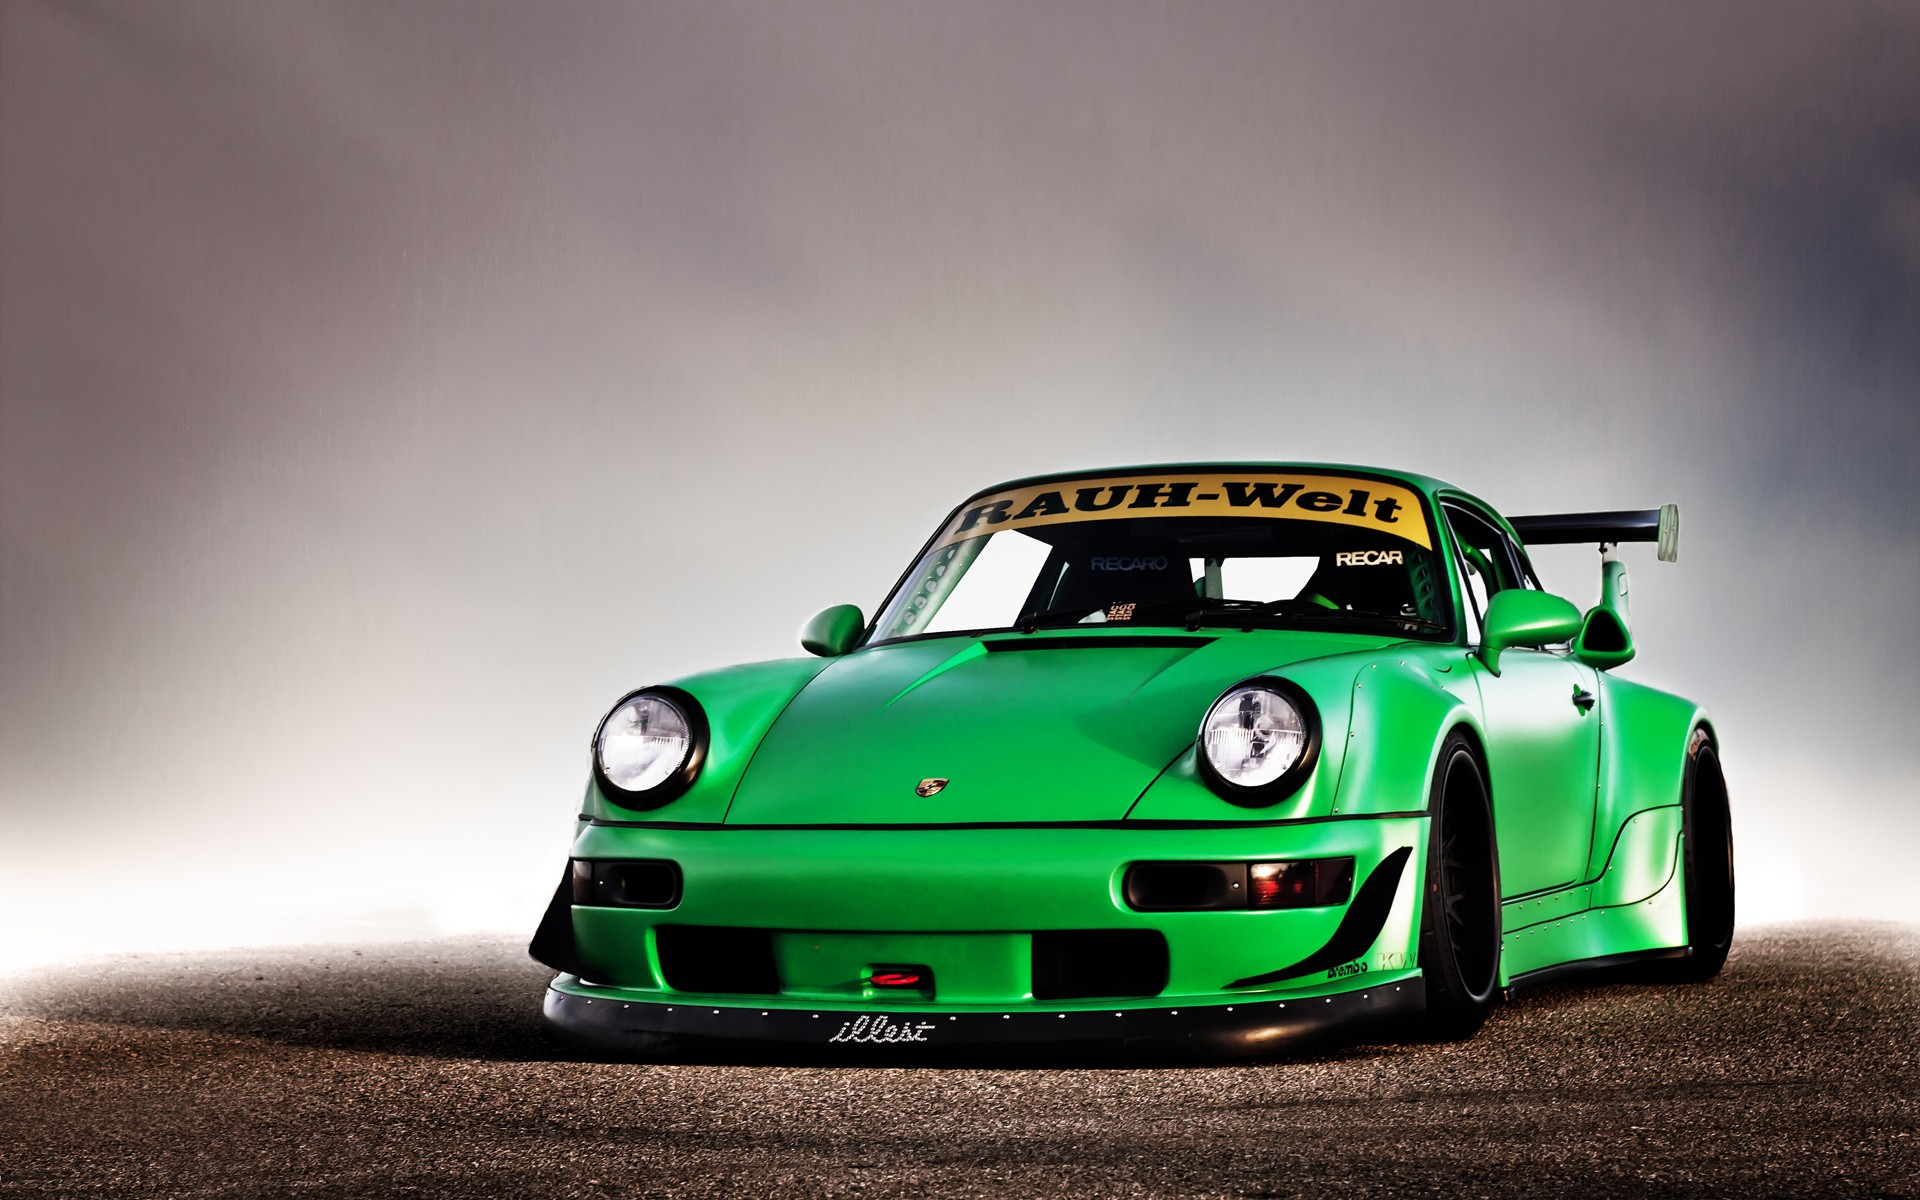 Porsche 911 Rwb Pandora One Wallpaper Hd Car Wallpapers